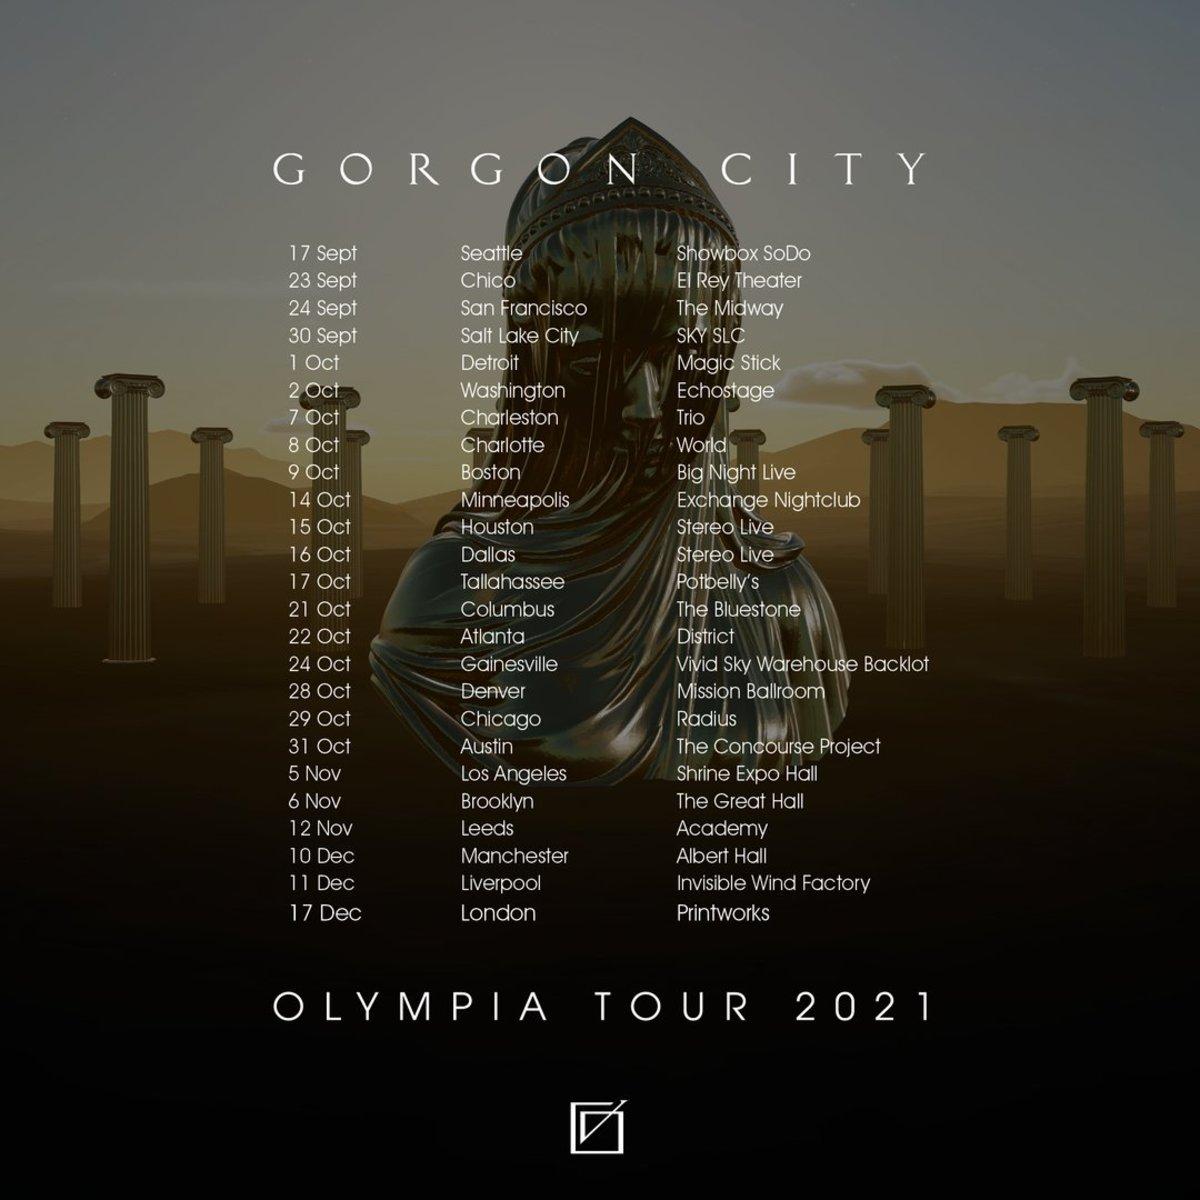 Gorgon City 2021